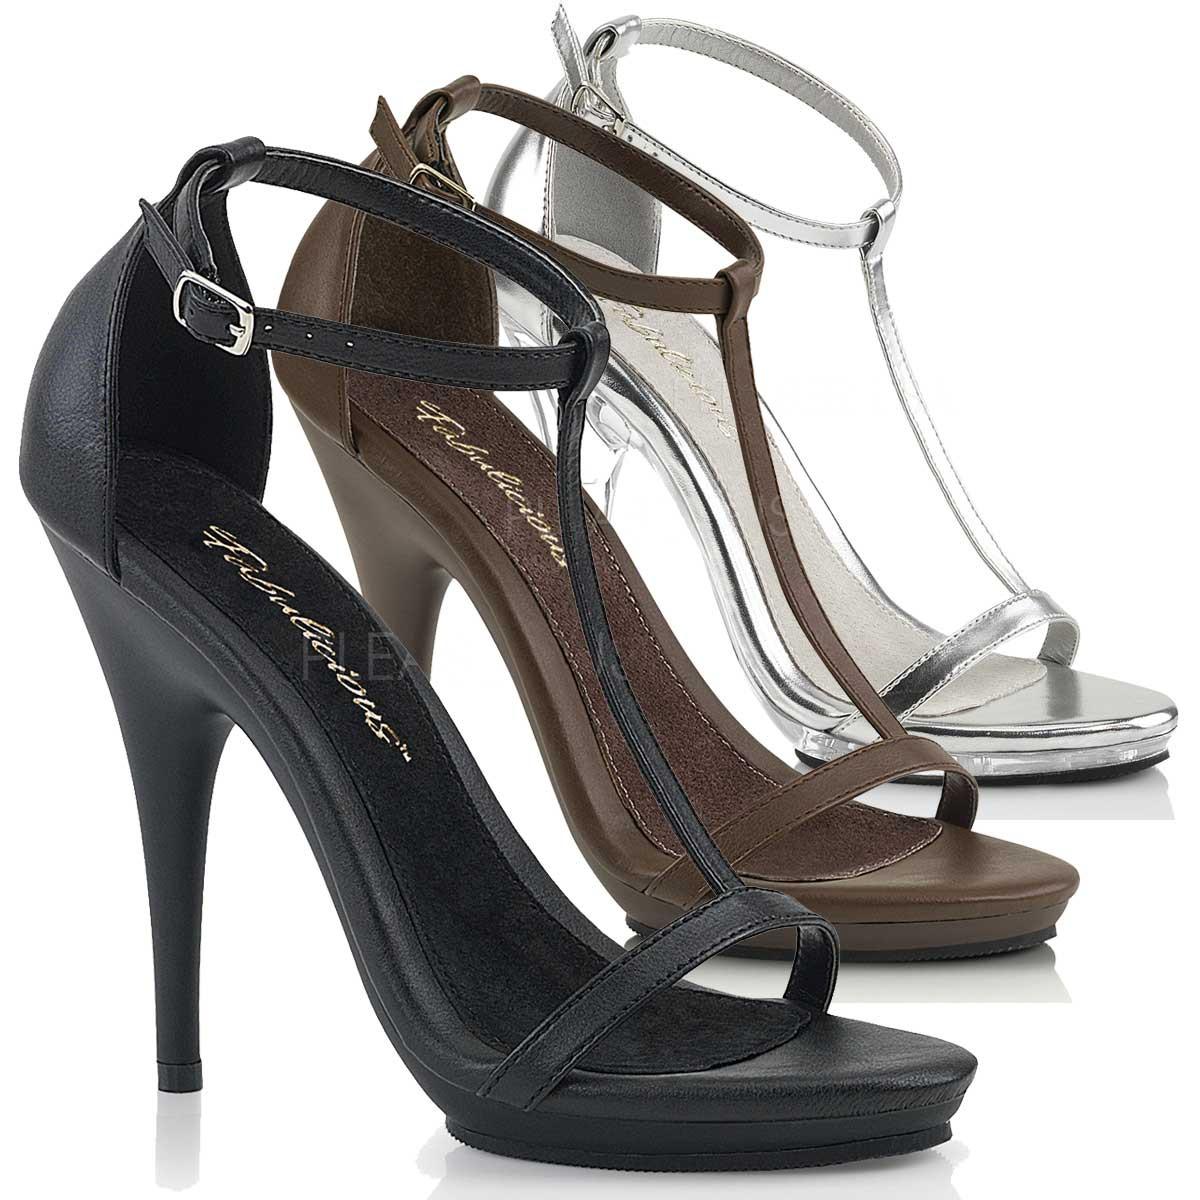 5 Inch High Heels Zrpwigmx